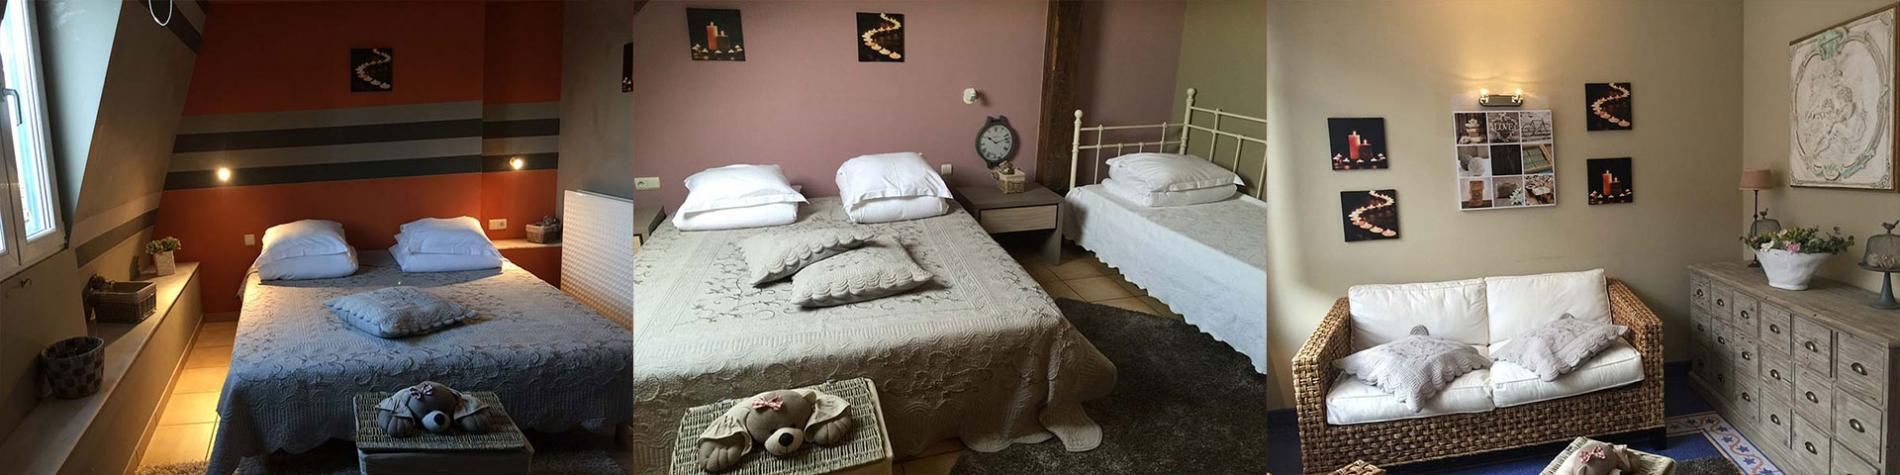 Hôtel - Margot'L - Rochefort - 6 chambres confortables